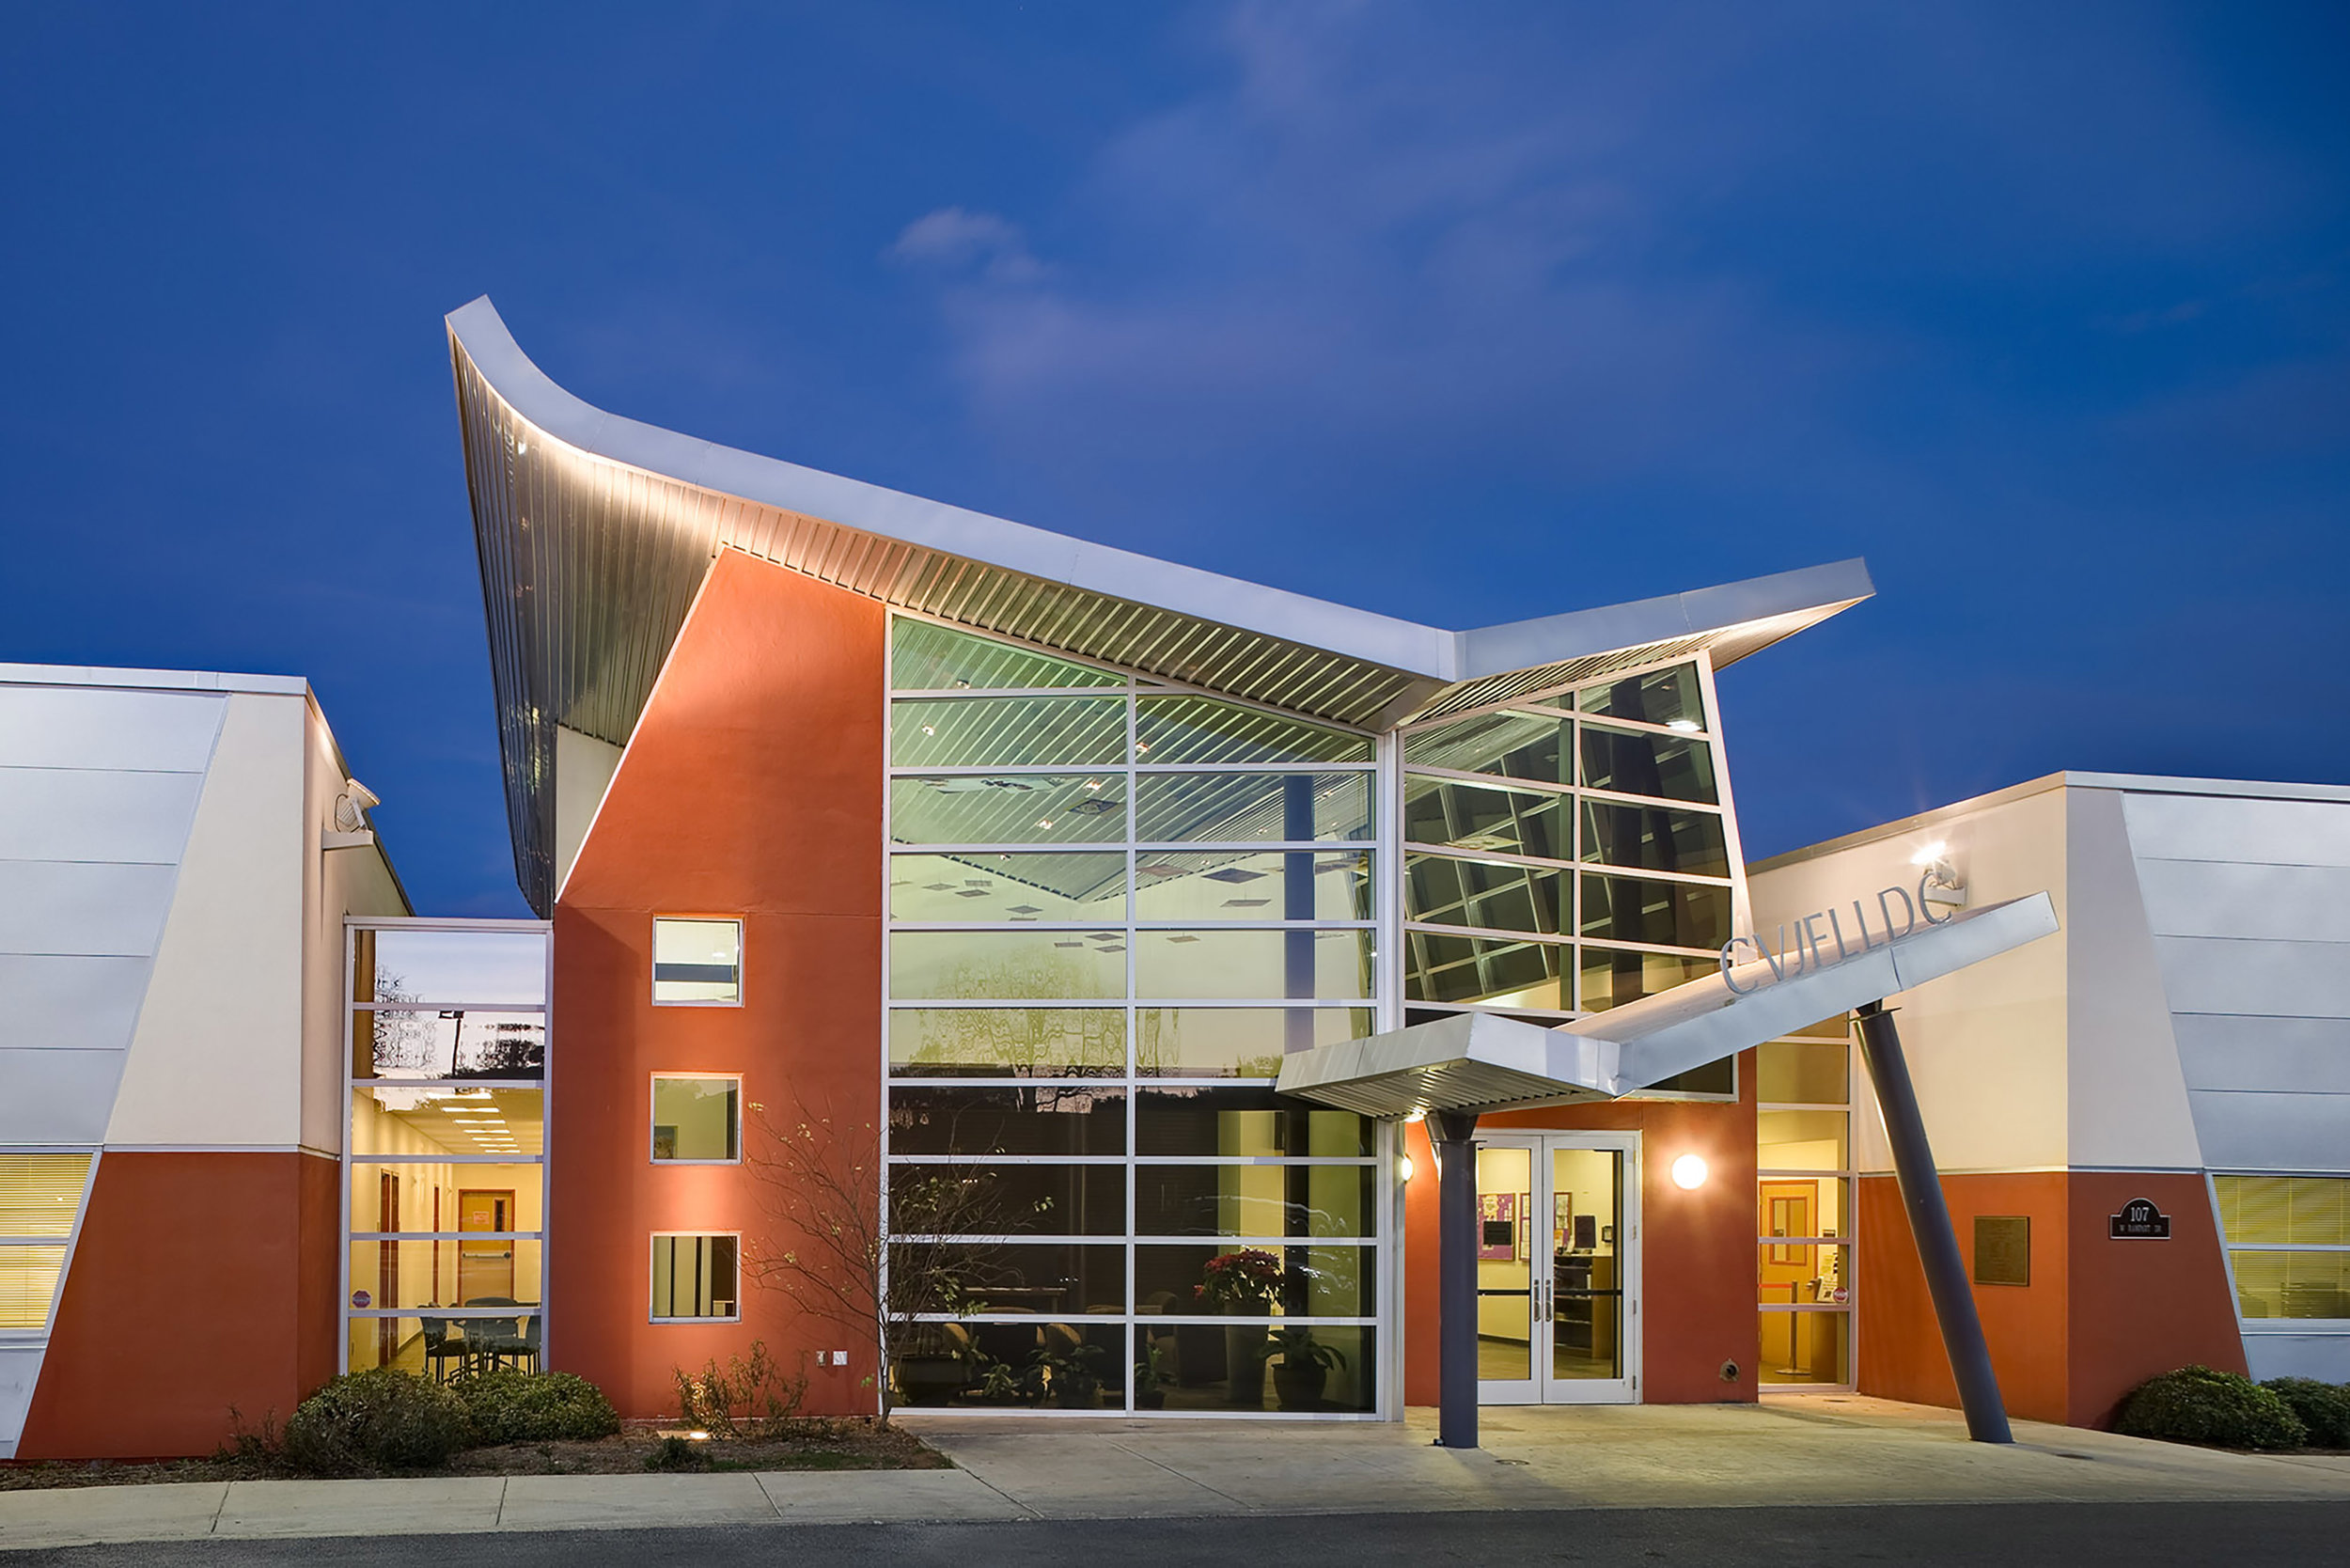 Exterior Image: Col. Victor Ferrari Community Learning Center